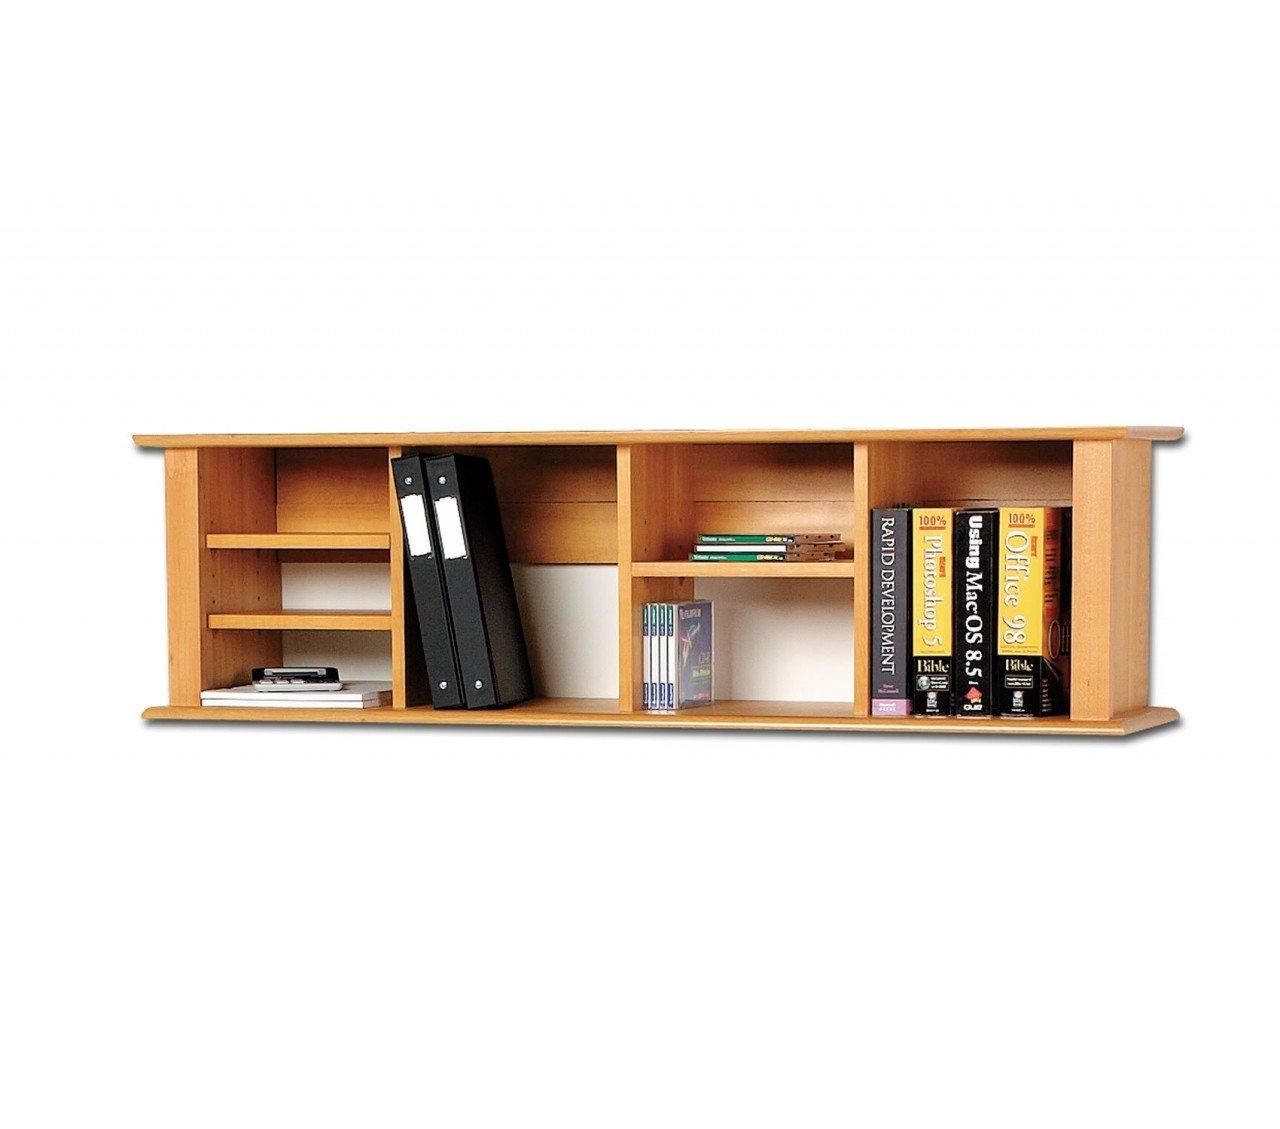 Wall Mounted Wood Shelves Decor Ideasdecor Ideas